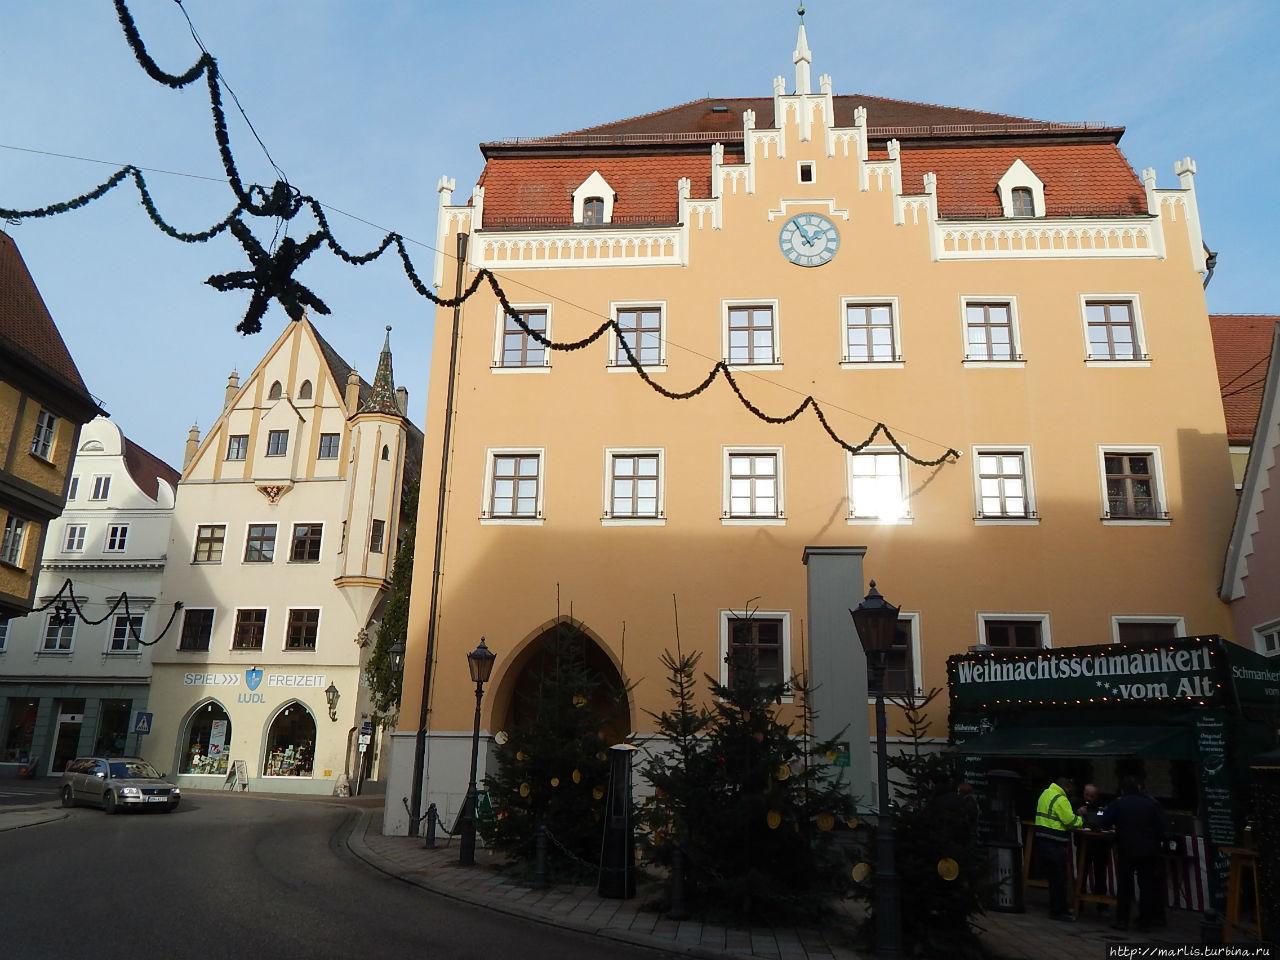 Здание ратуши Донаувёрт, Германия